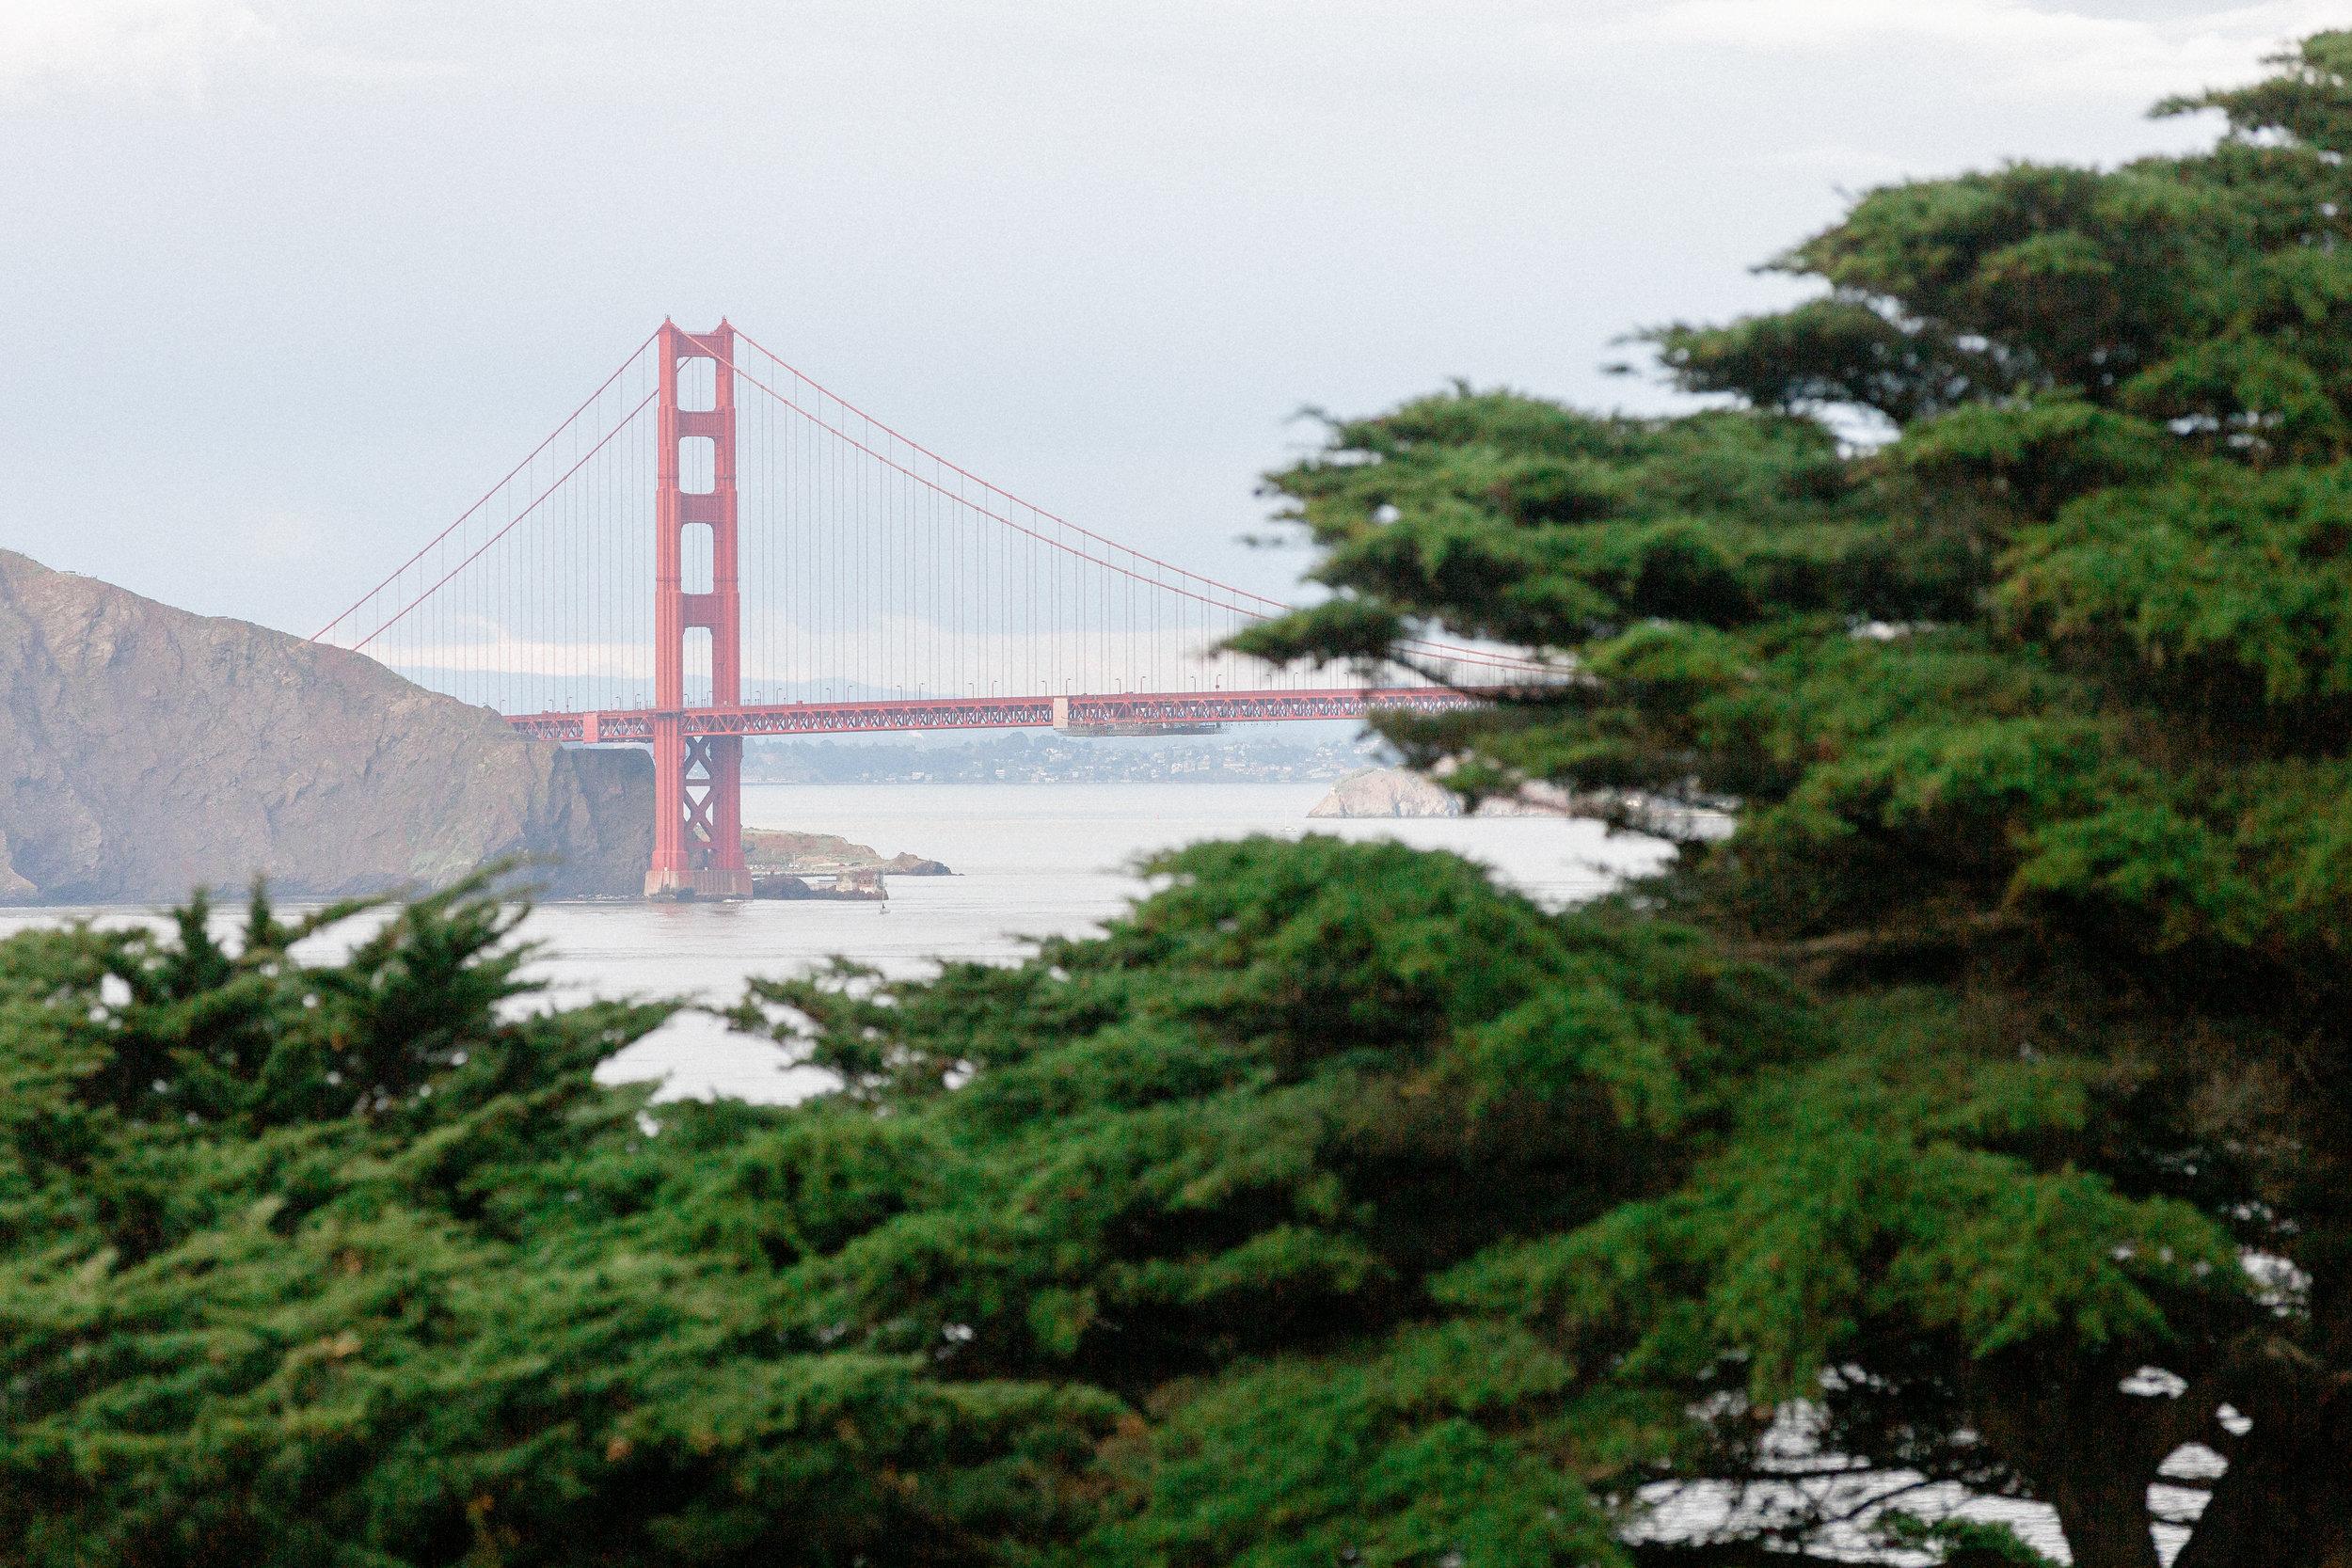 san-francisco-golden-gate-bridge-overlook-photo-lands-endjpg